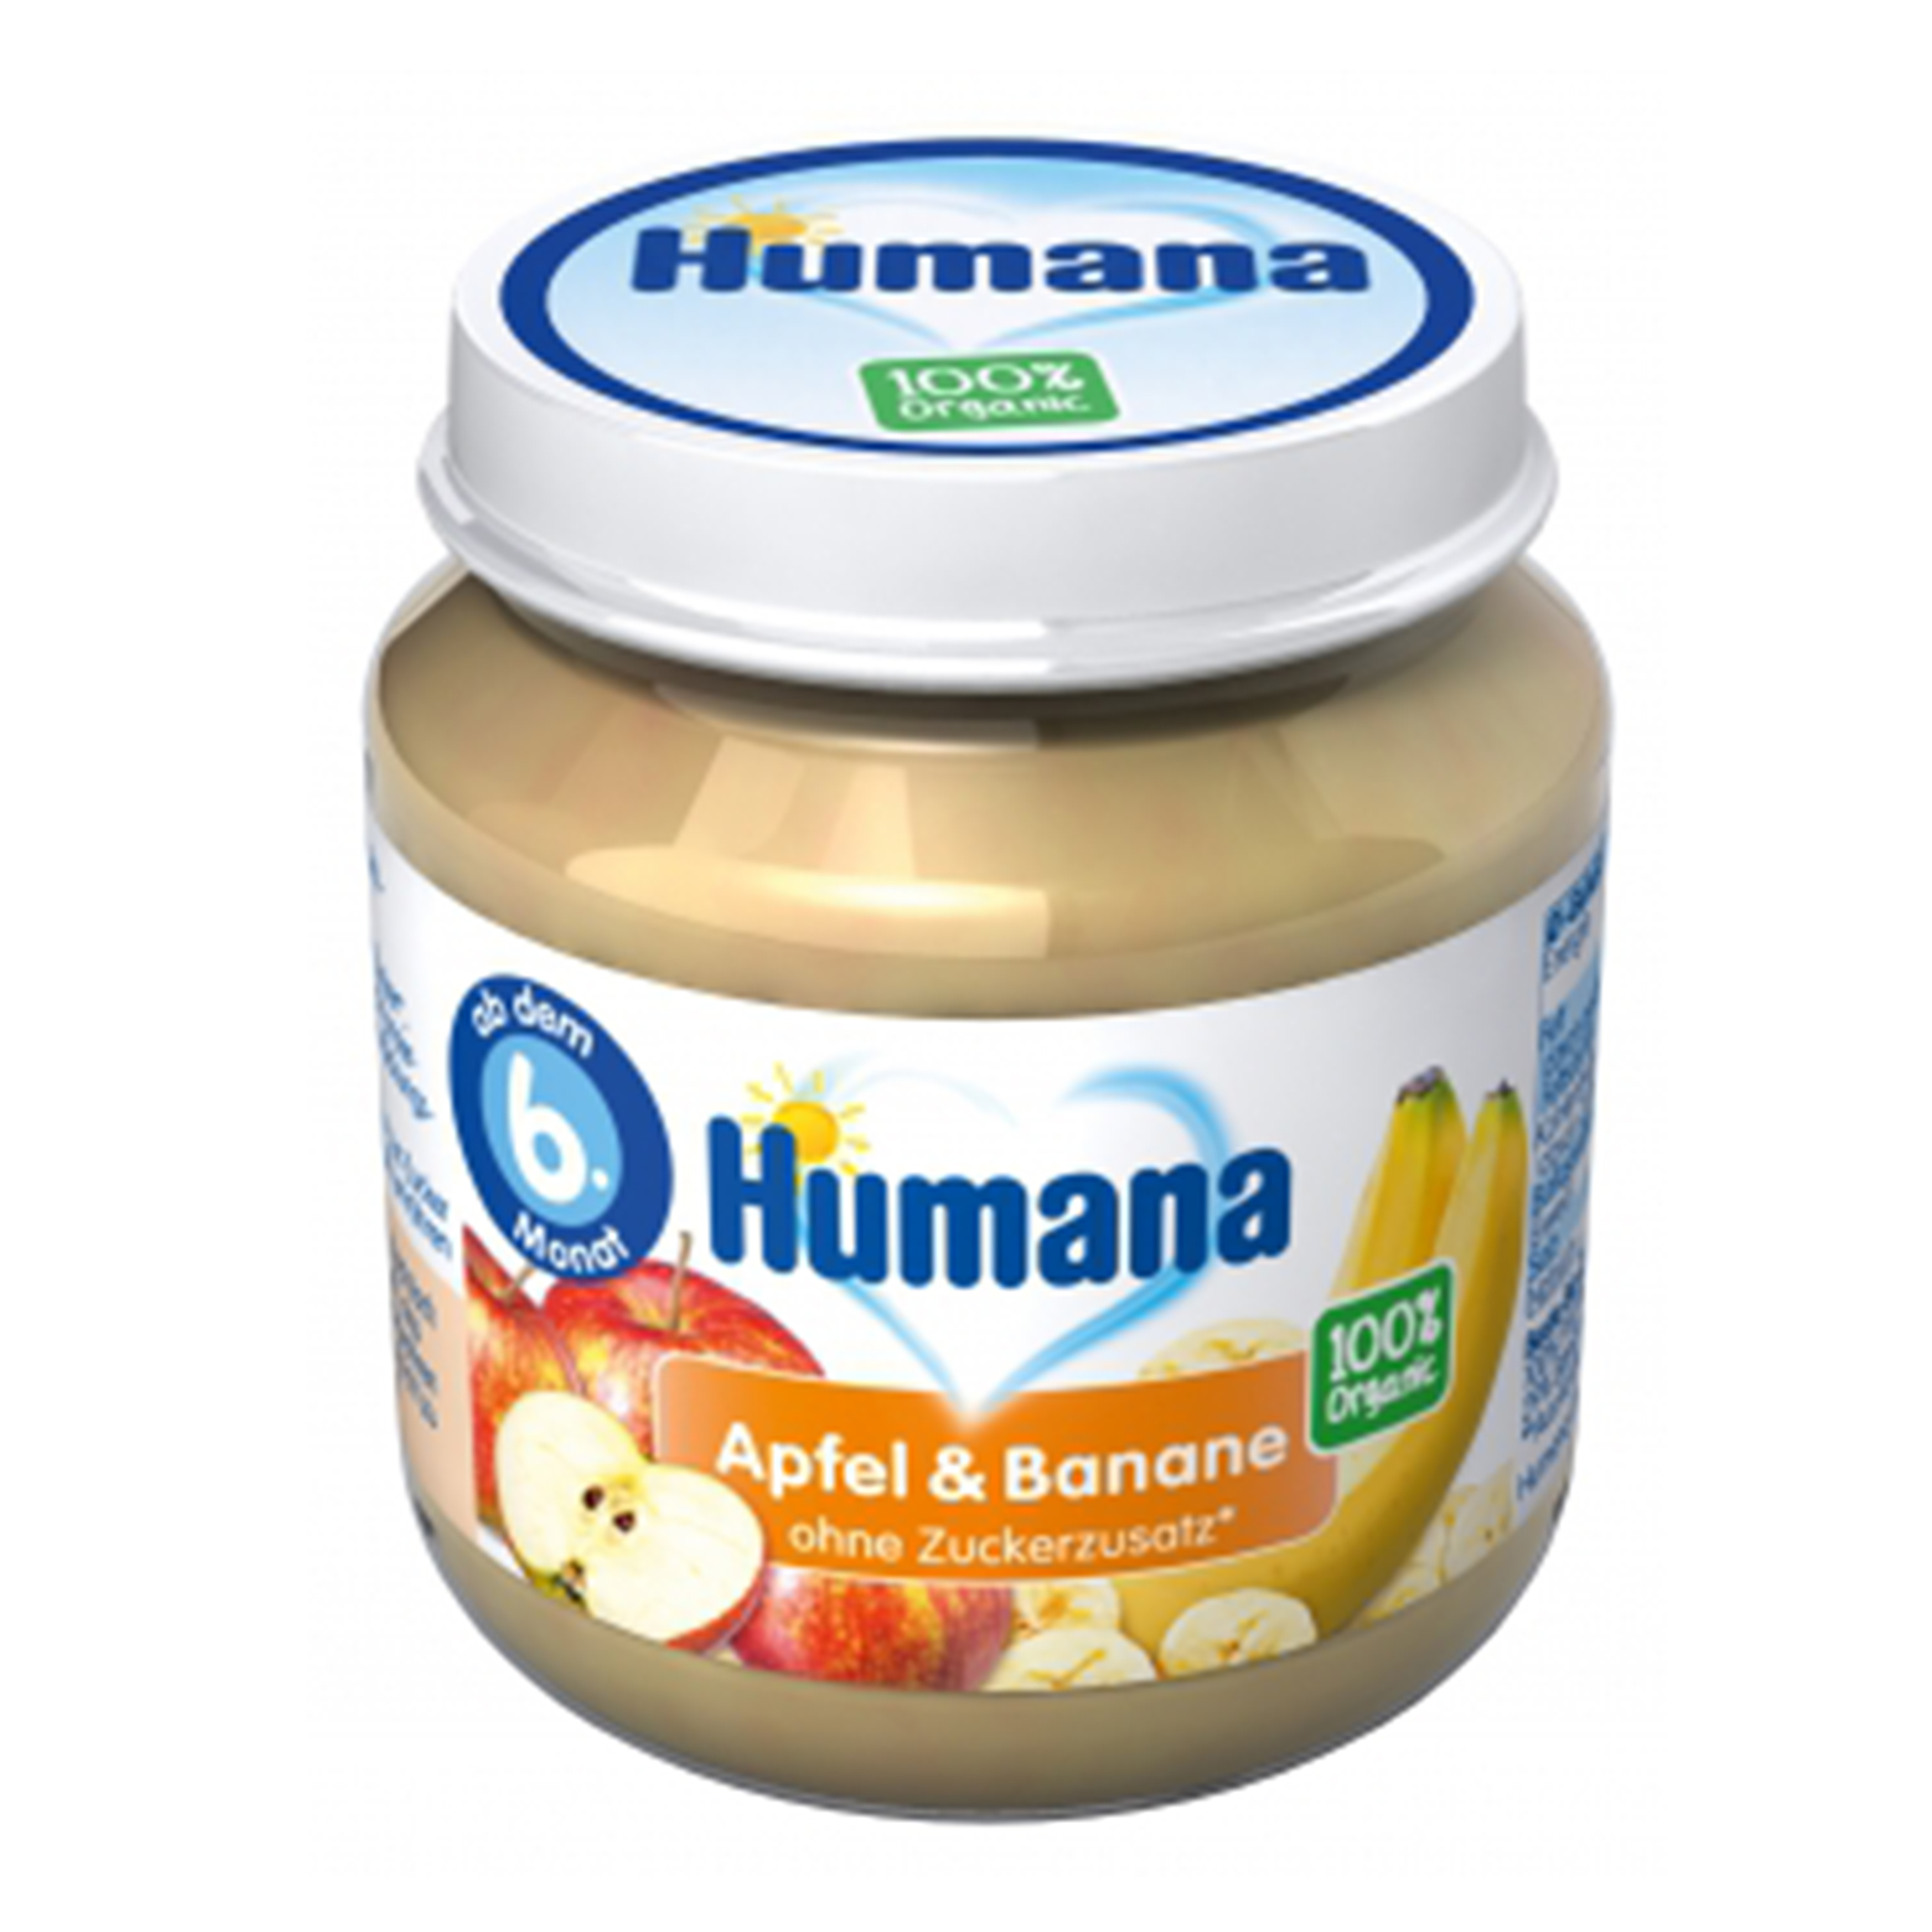 Piure ECO de banane si mere, Humana, 125g, 6luni+